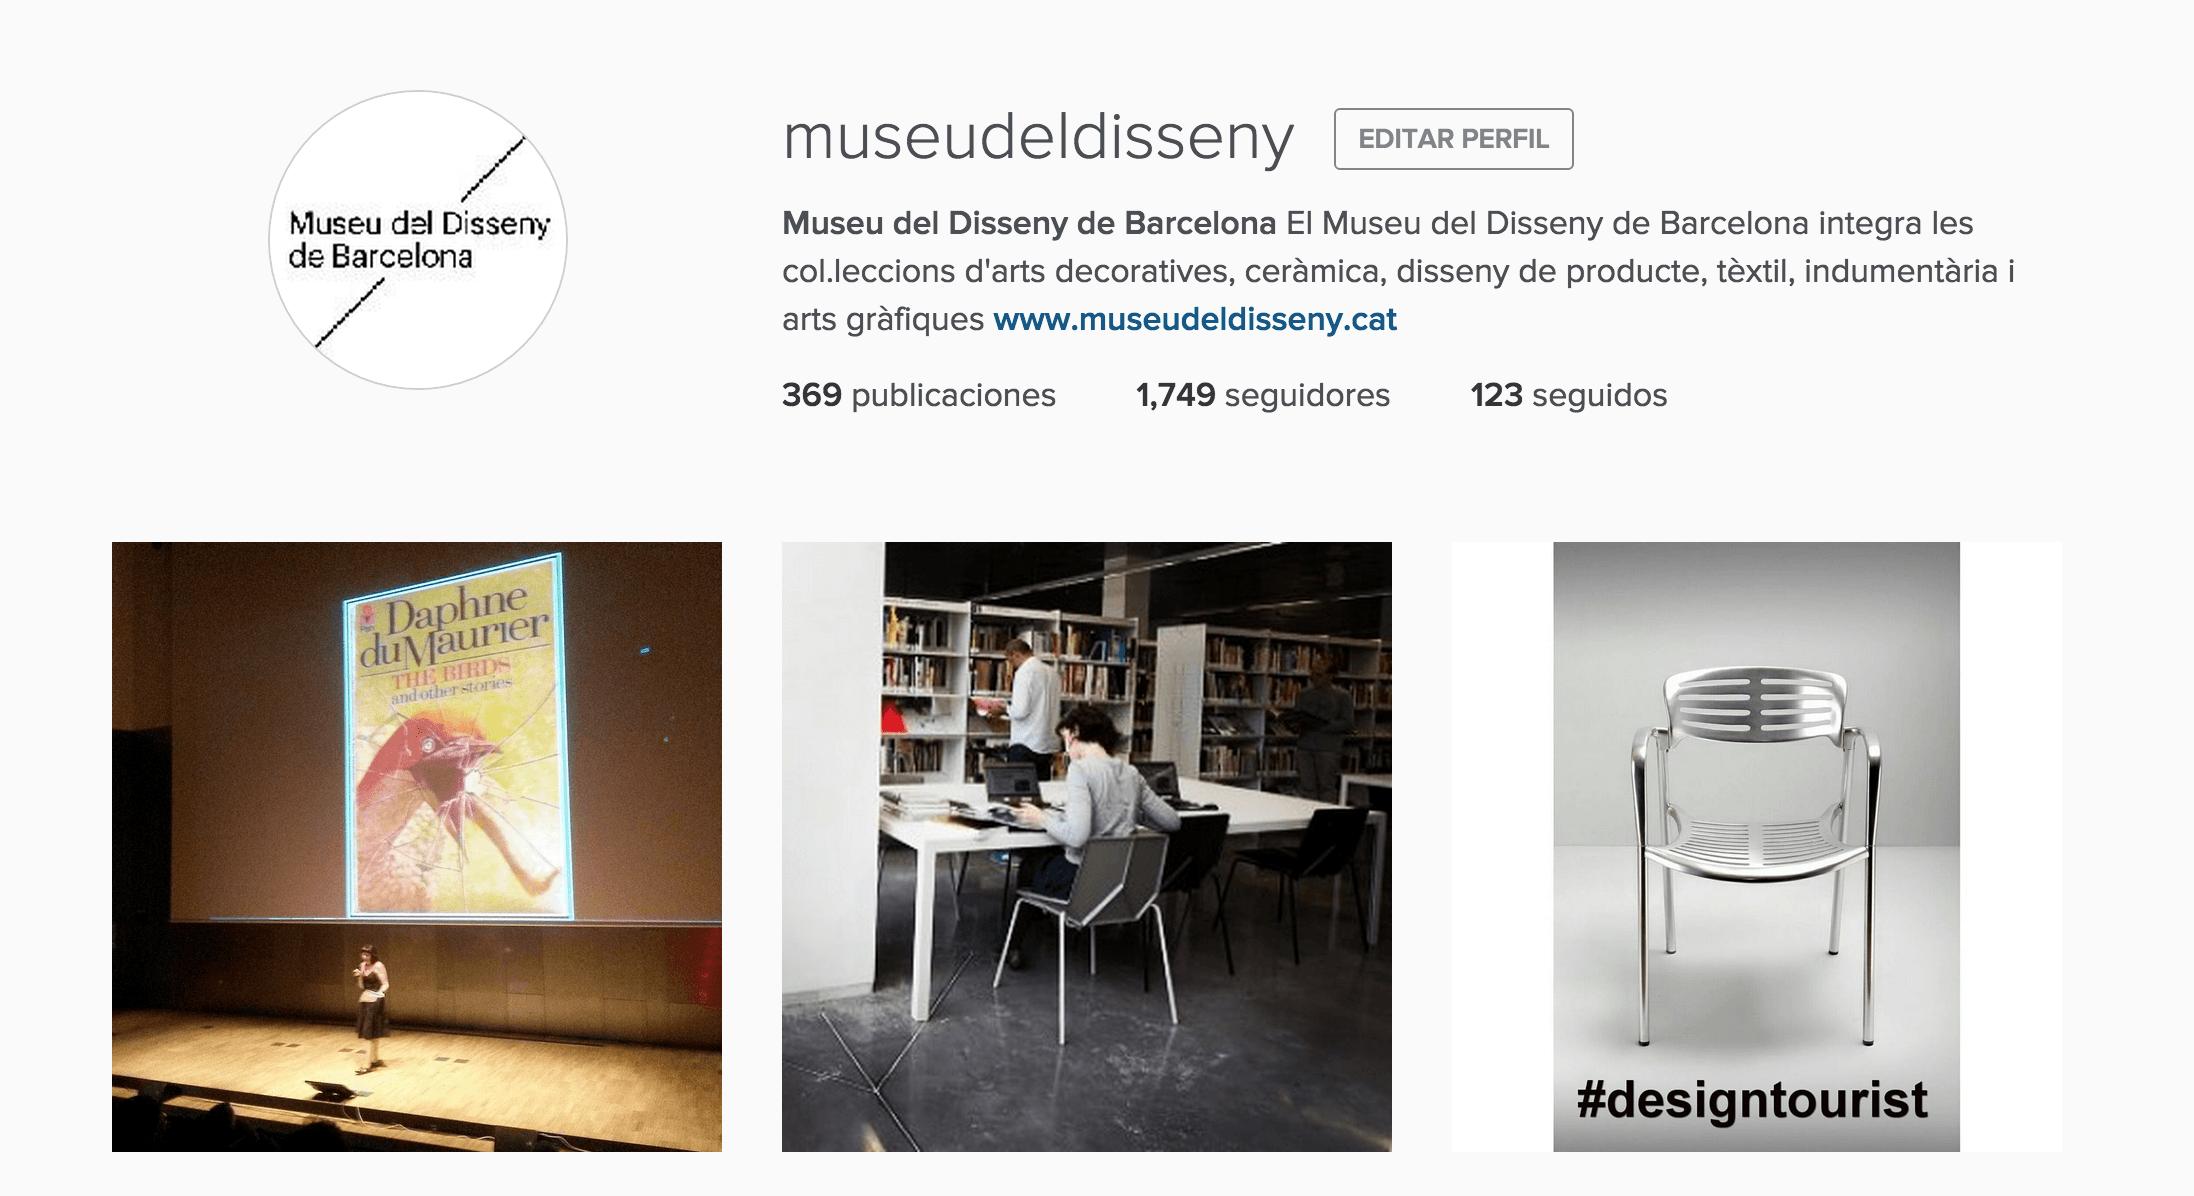 instagram_museudisseny